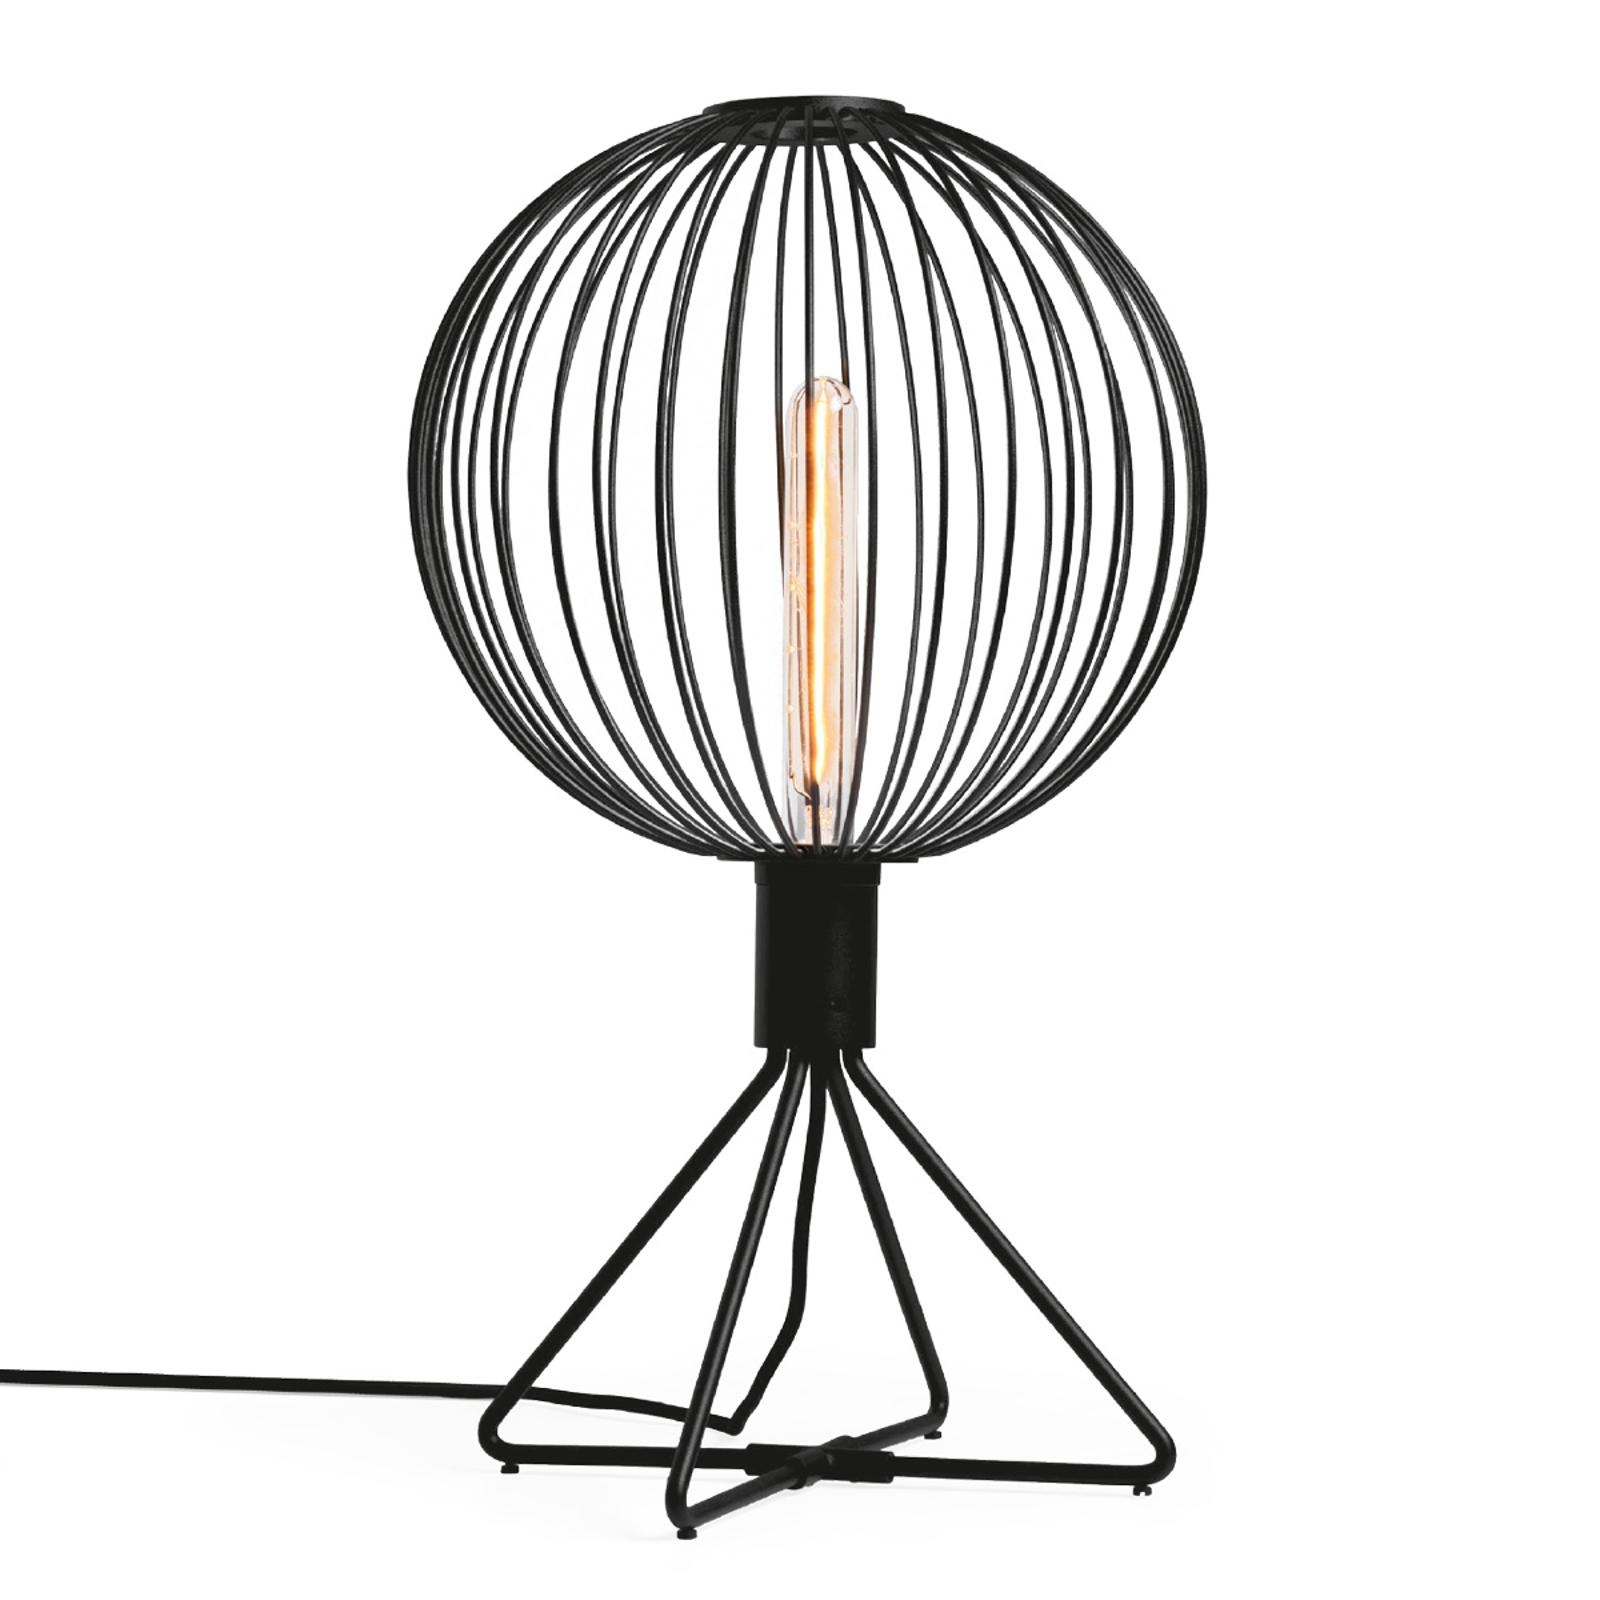 WEVER & DUCRÉ Wiro 1.0 Globe tafellamp zwart